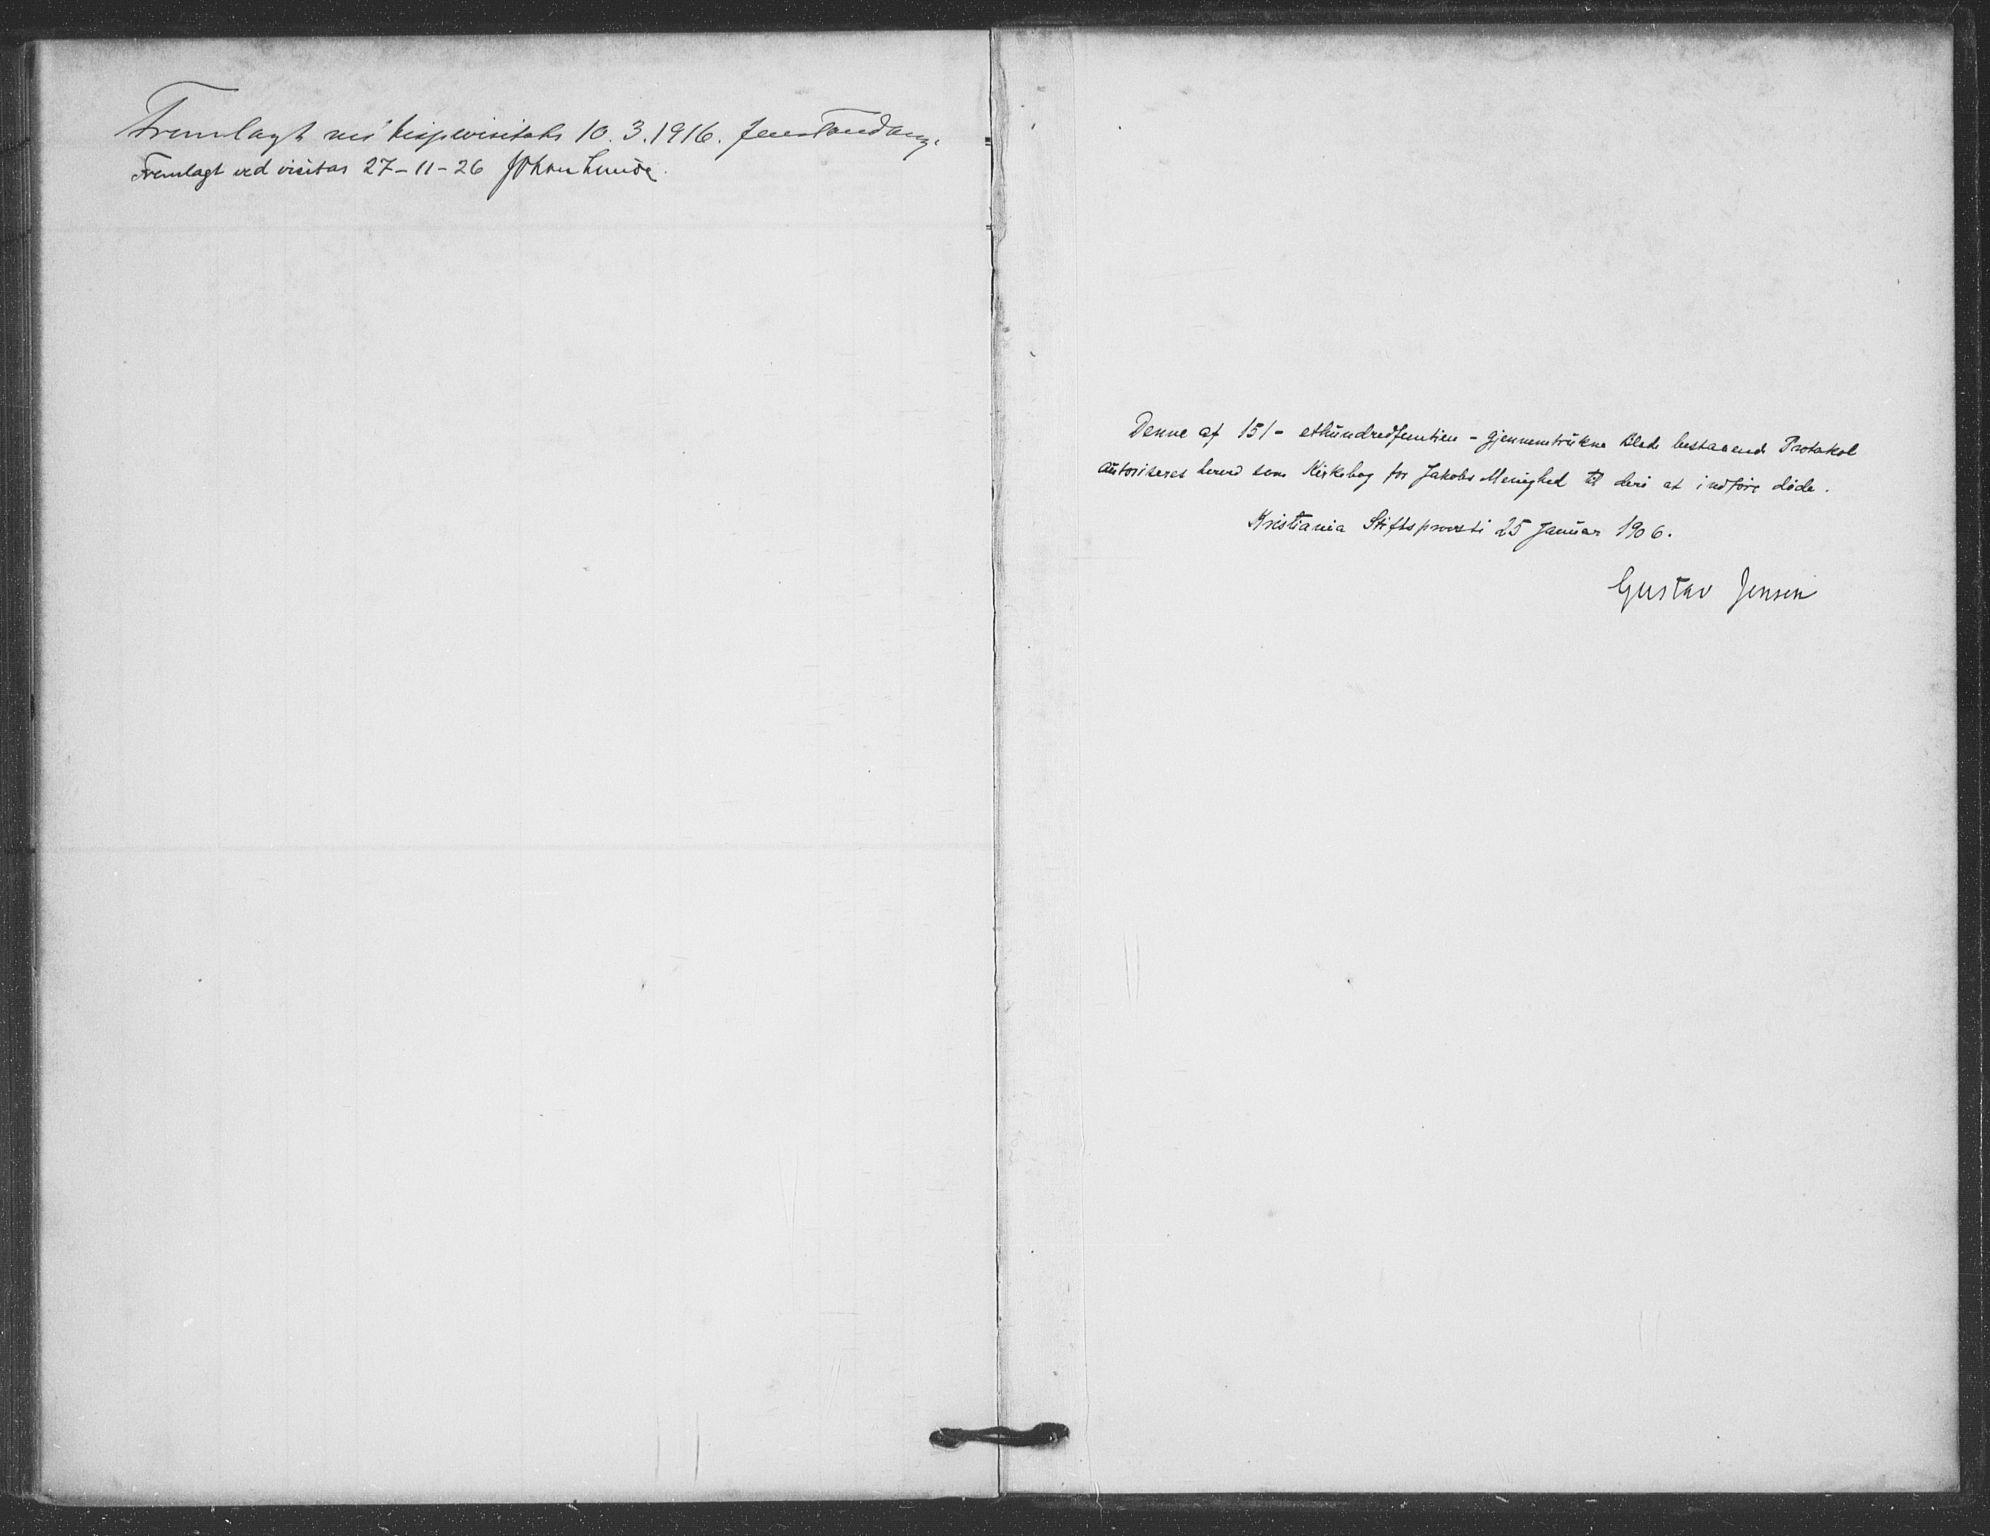 SAO, Jakob prestekontor Kirkebøker, F/Fa/L0011: Ministerialbok nr. 11, 1906-1920